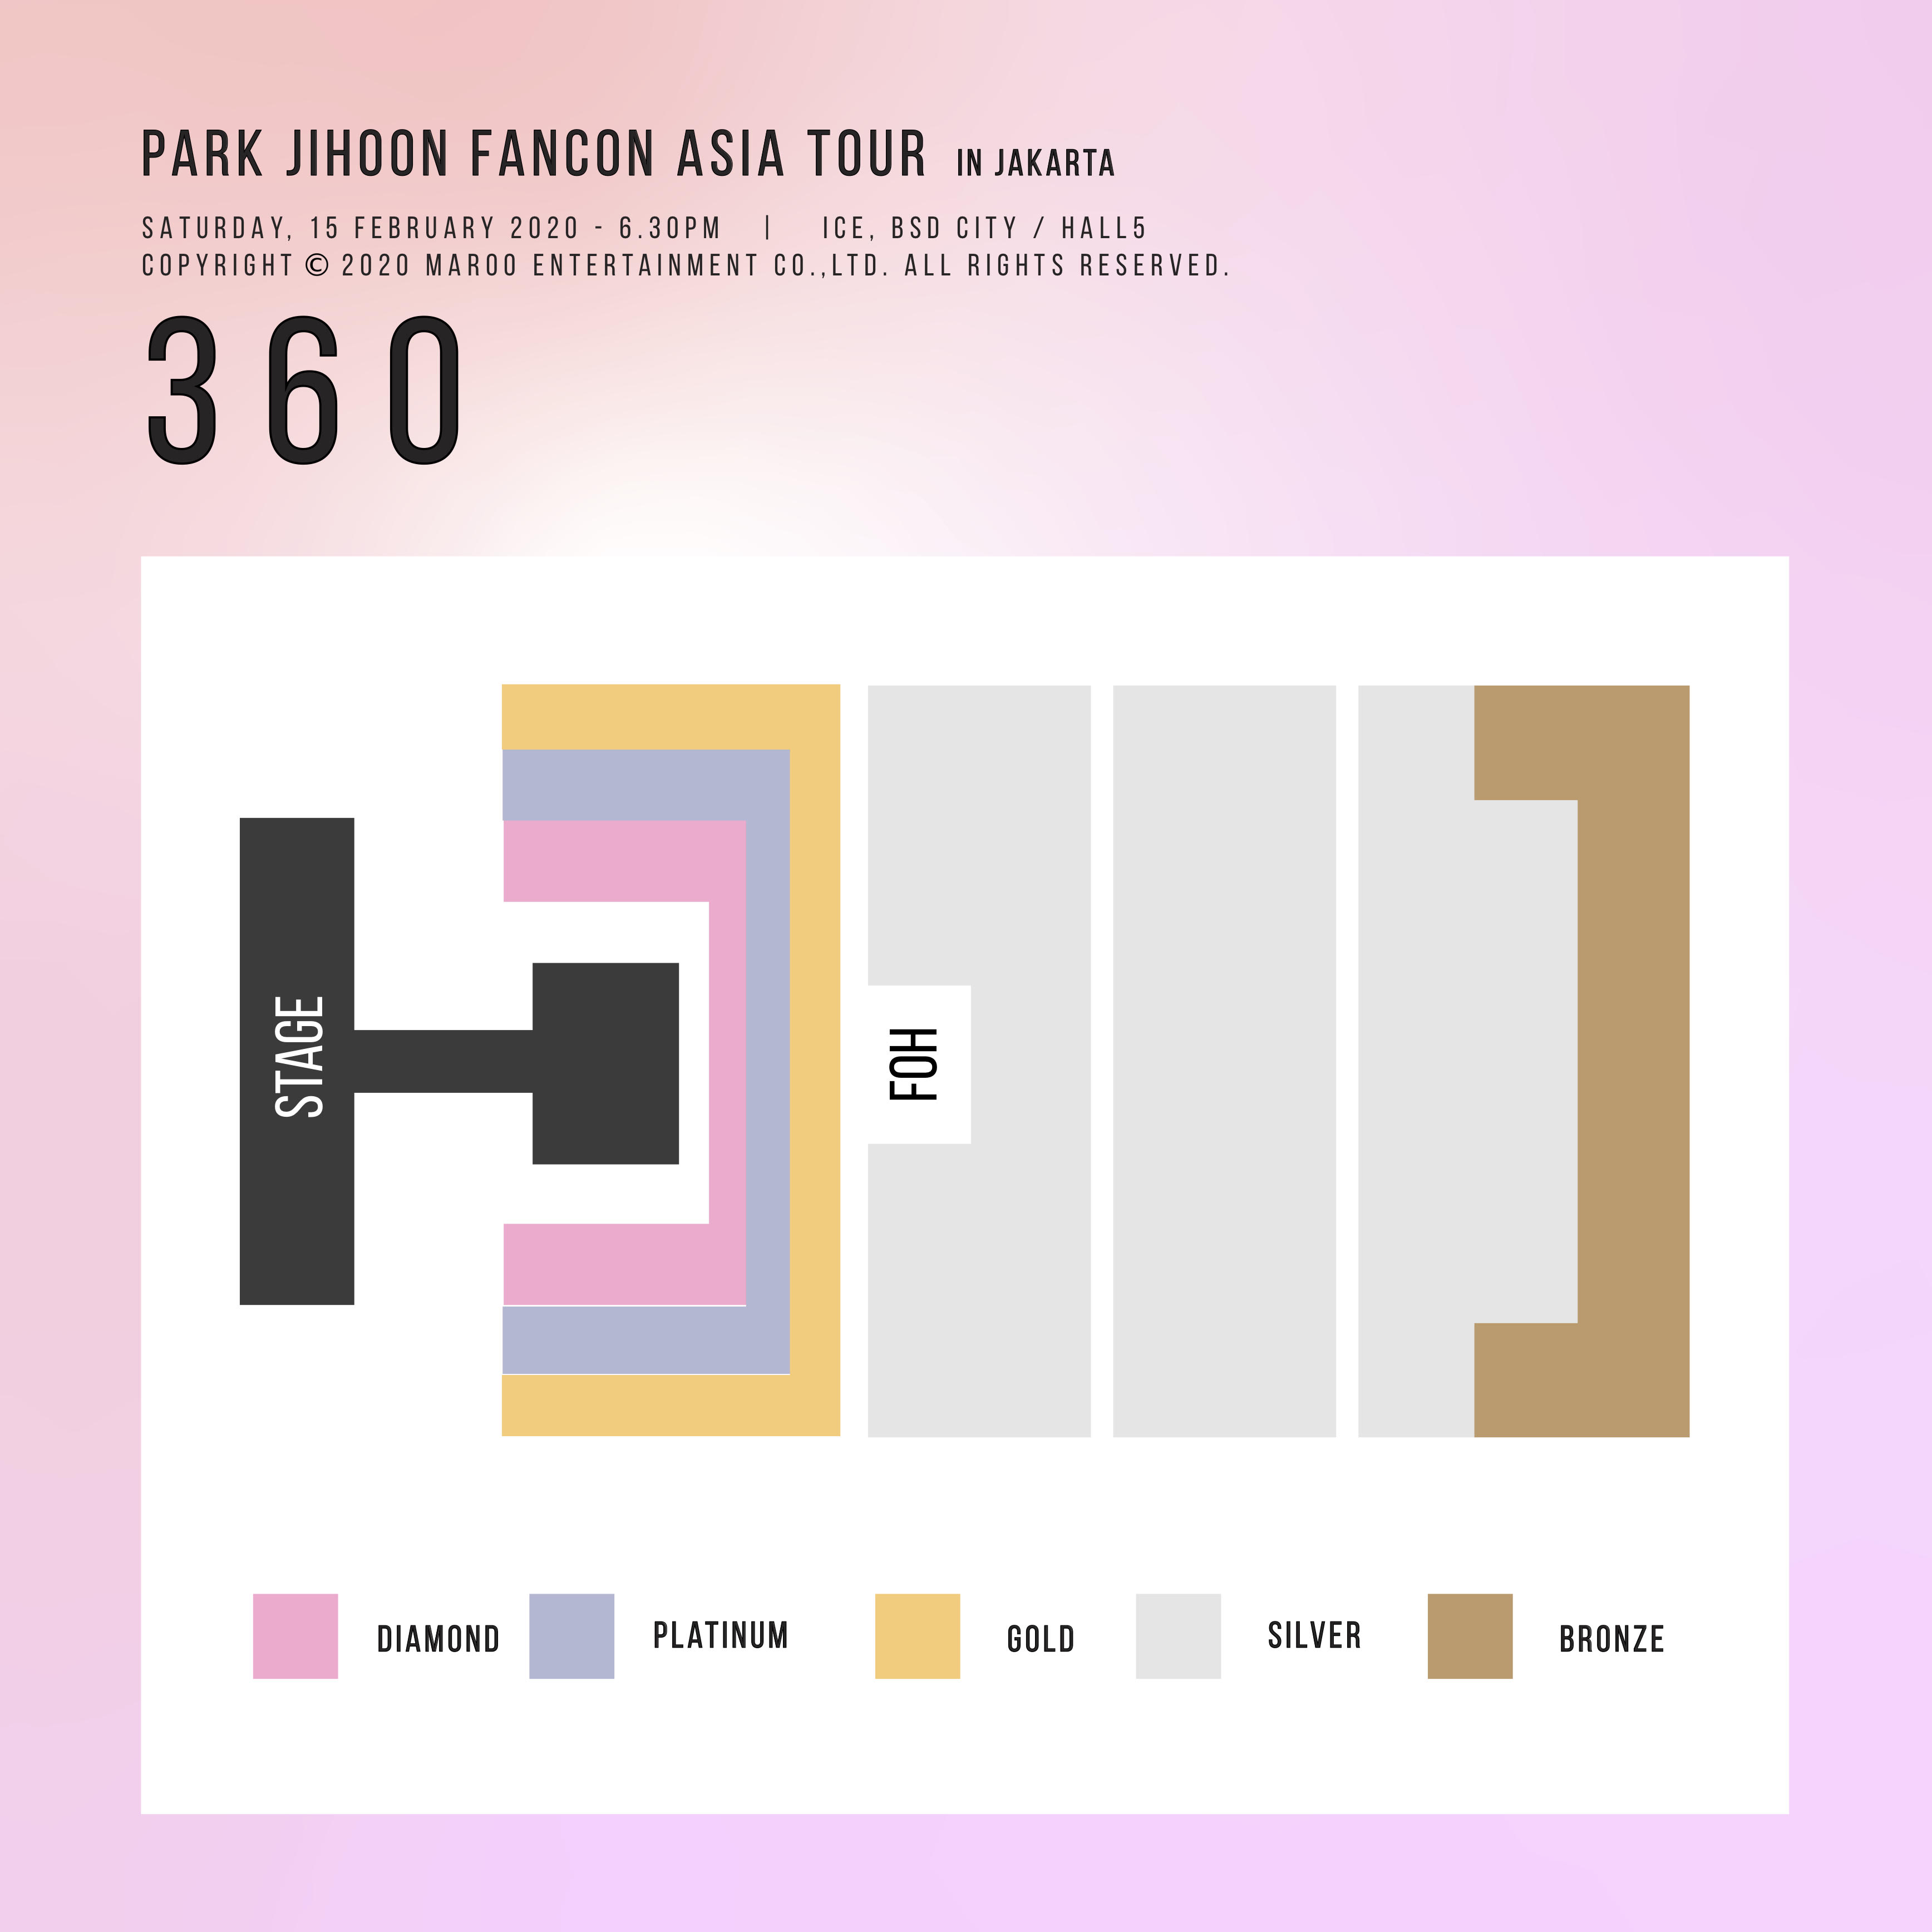 PARK JIHOON FANCON ASIA TOUR 2020